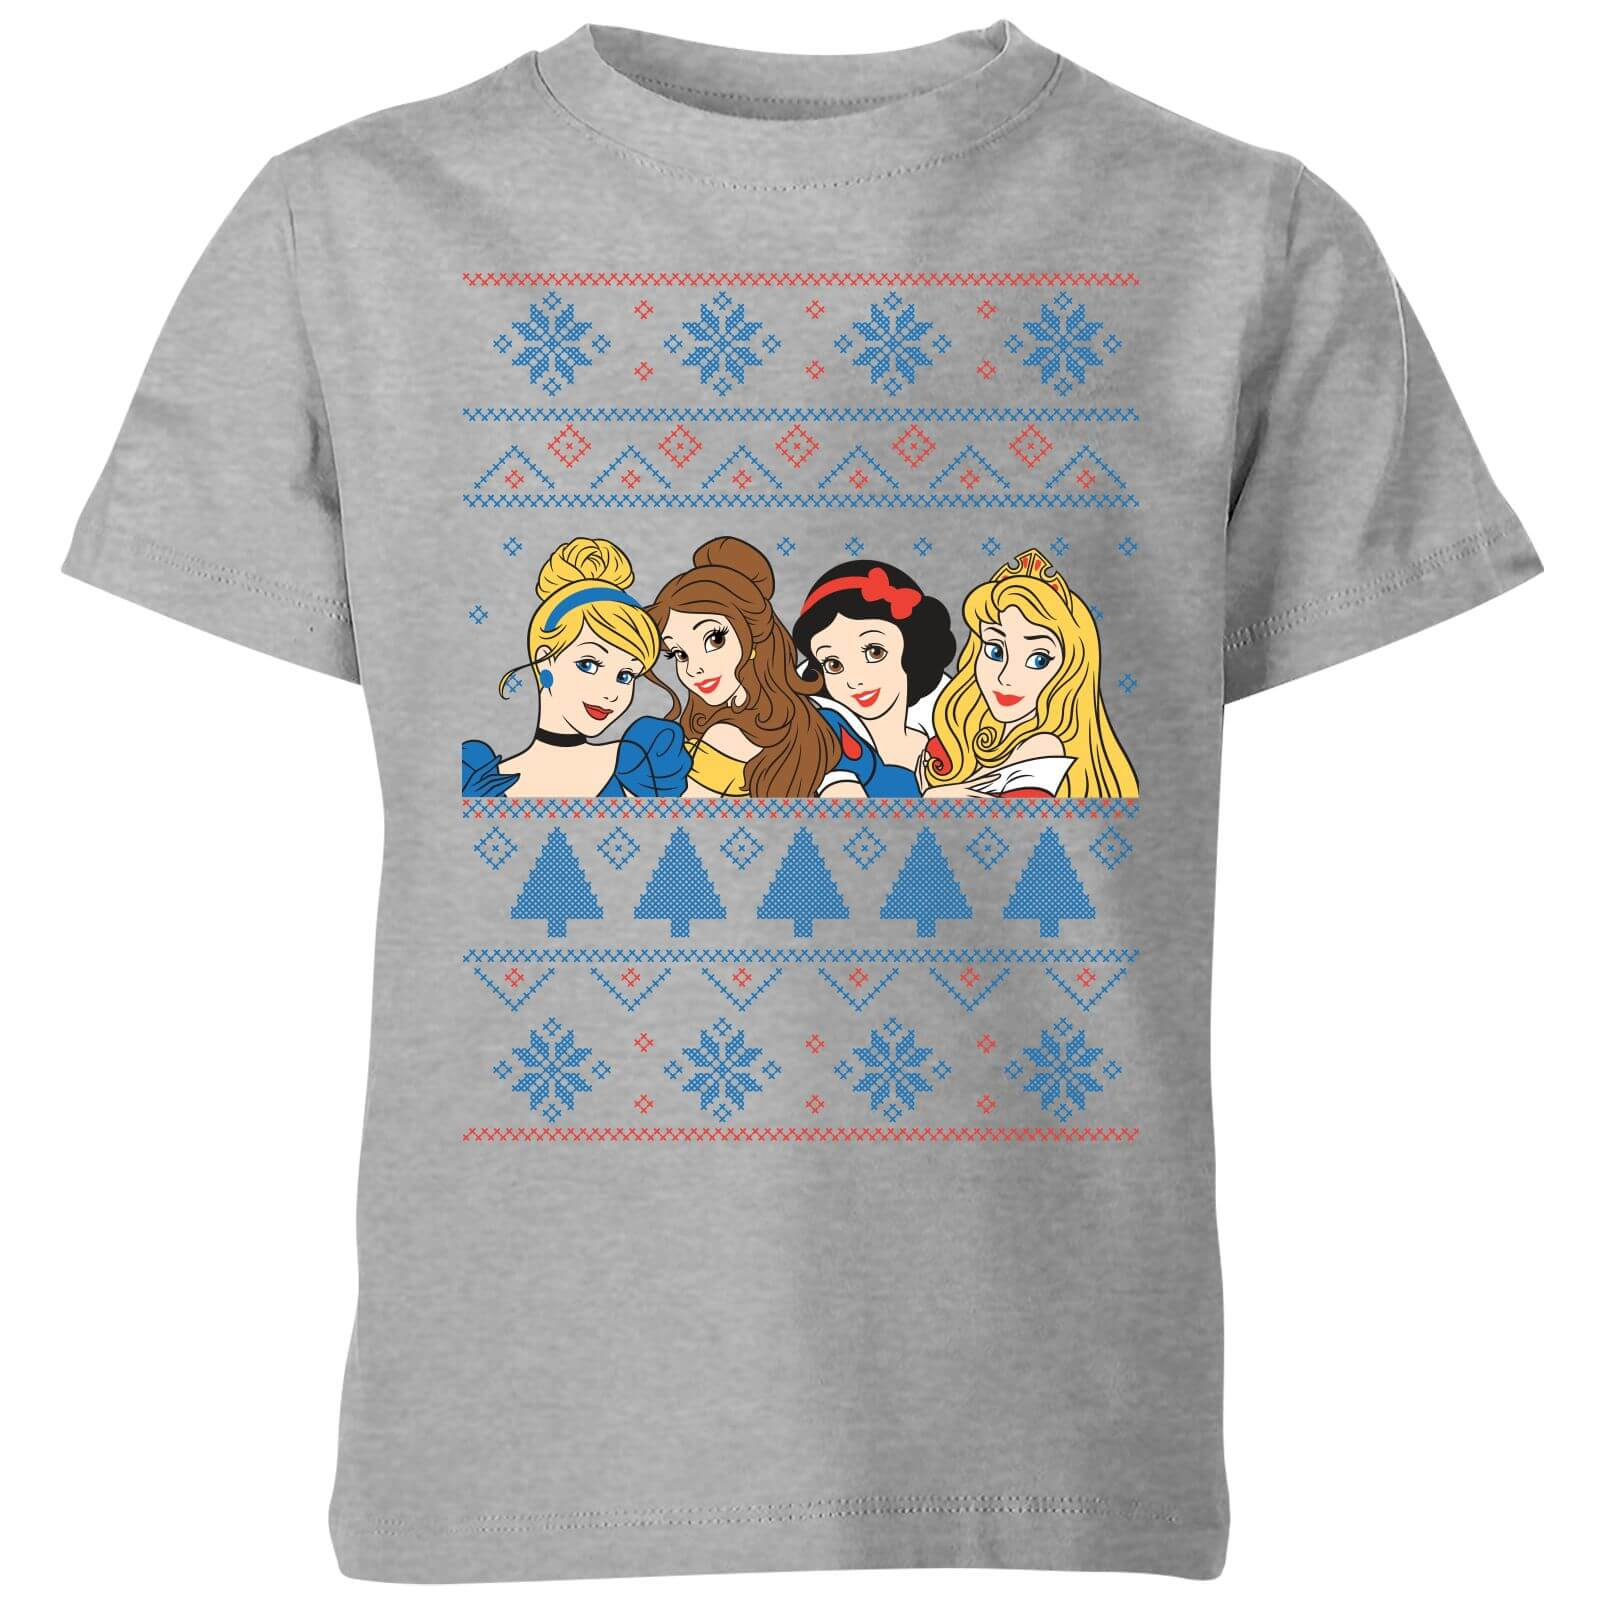 disney princess faces kids' christmas t-shirt - grey - 3-4 years - grey